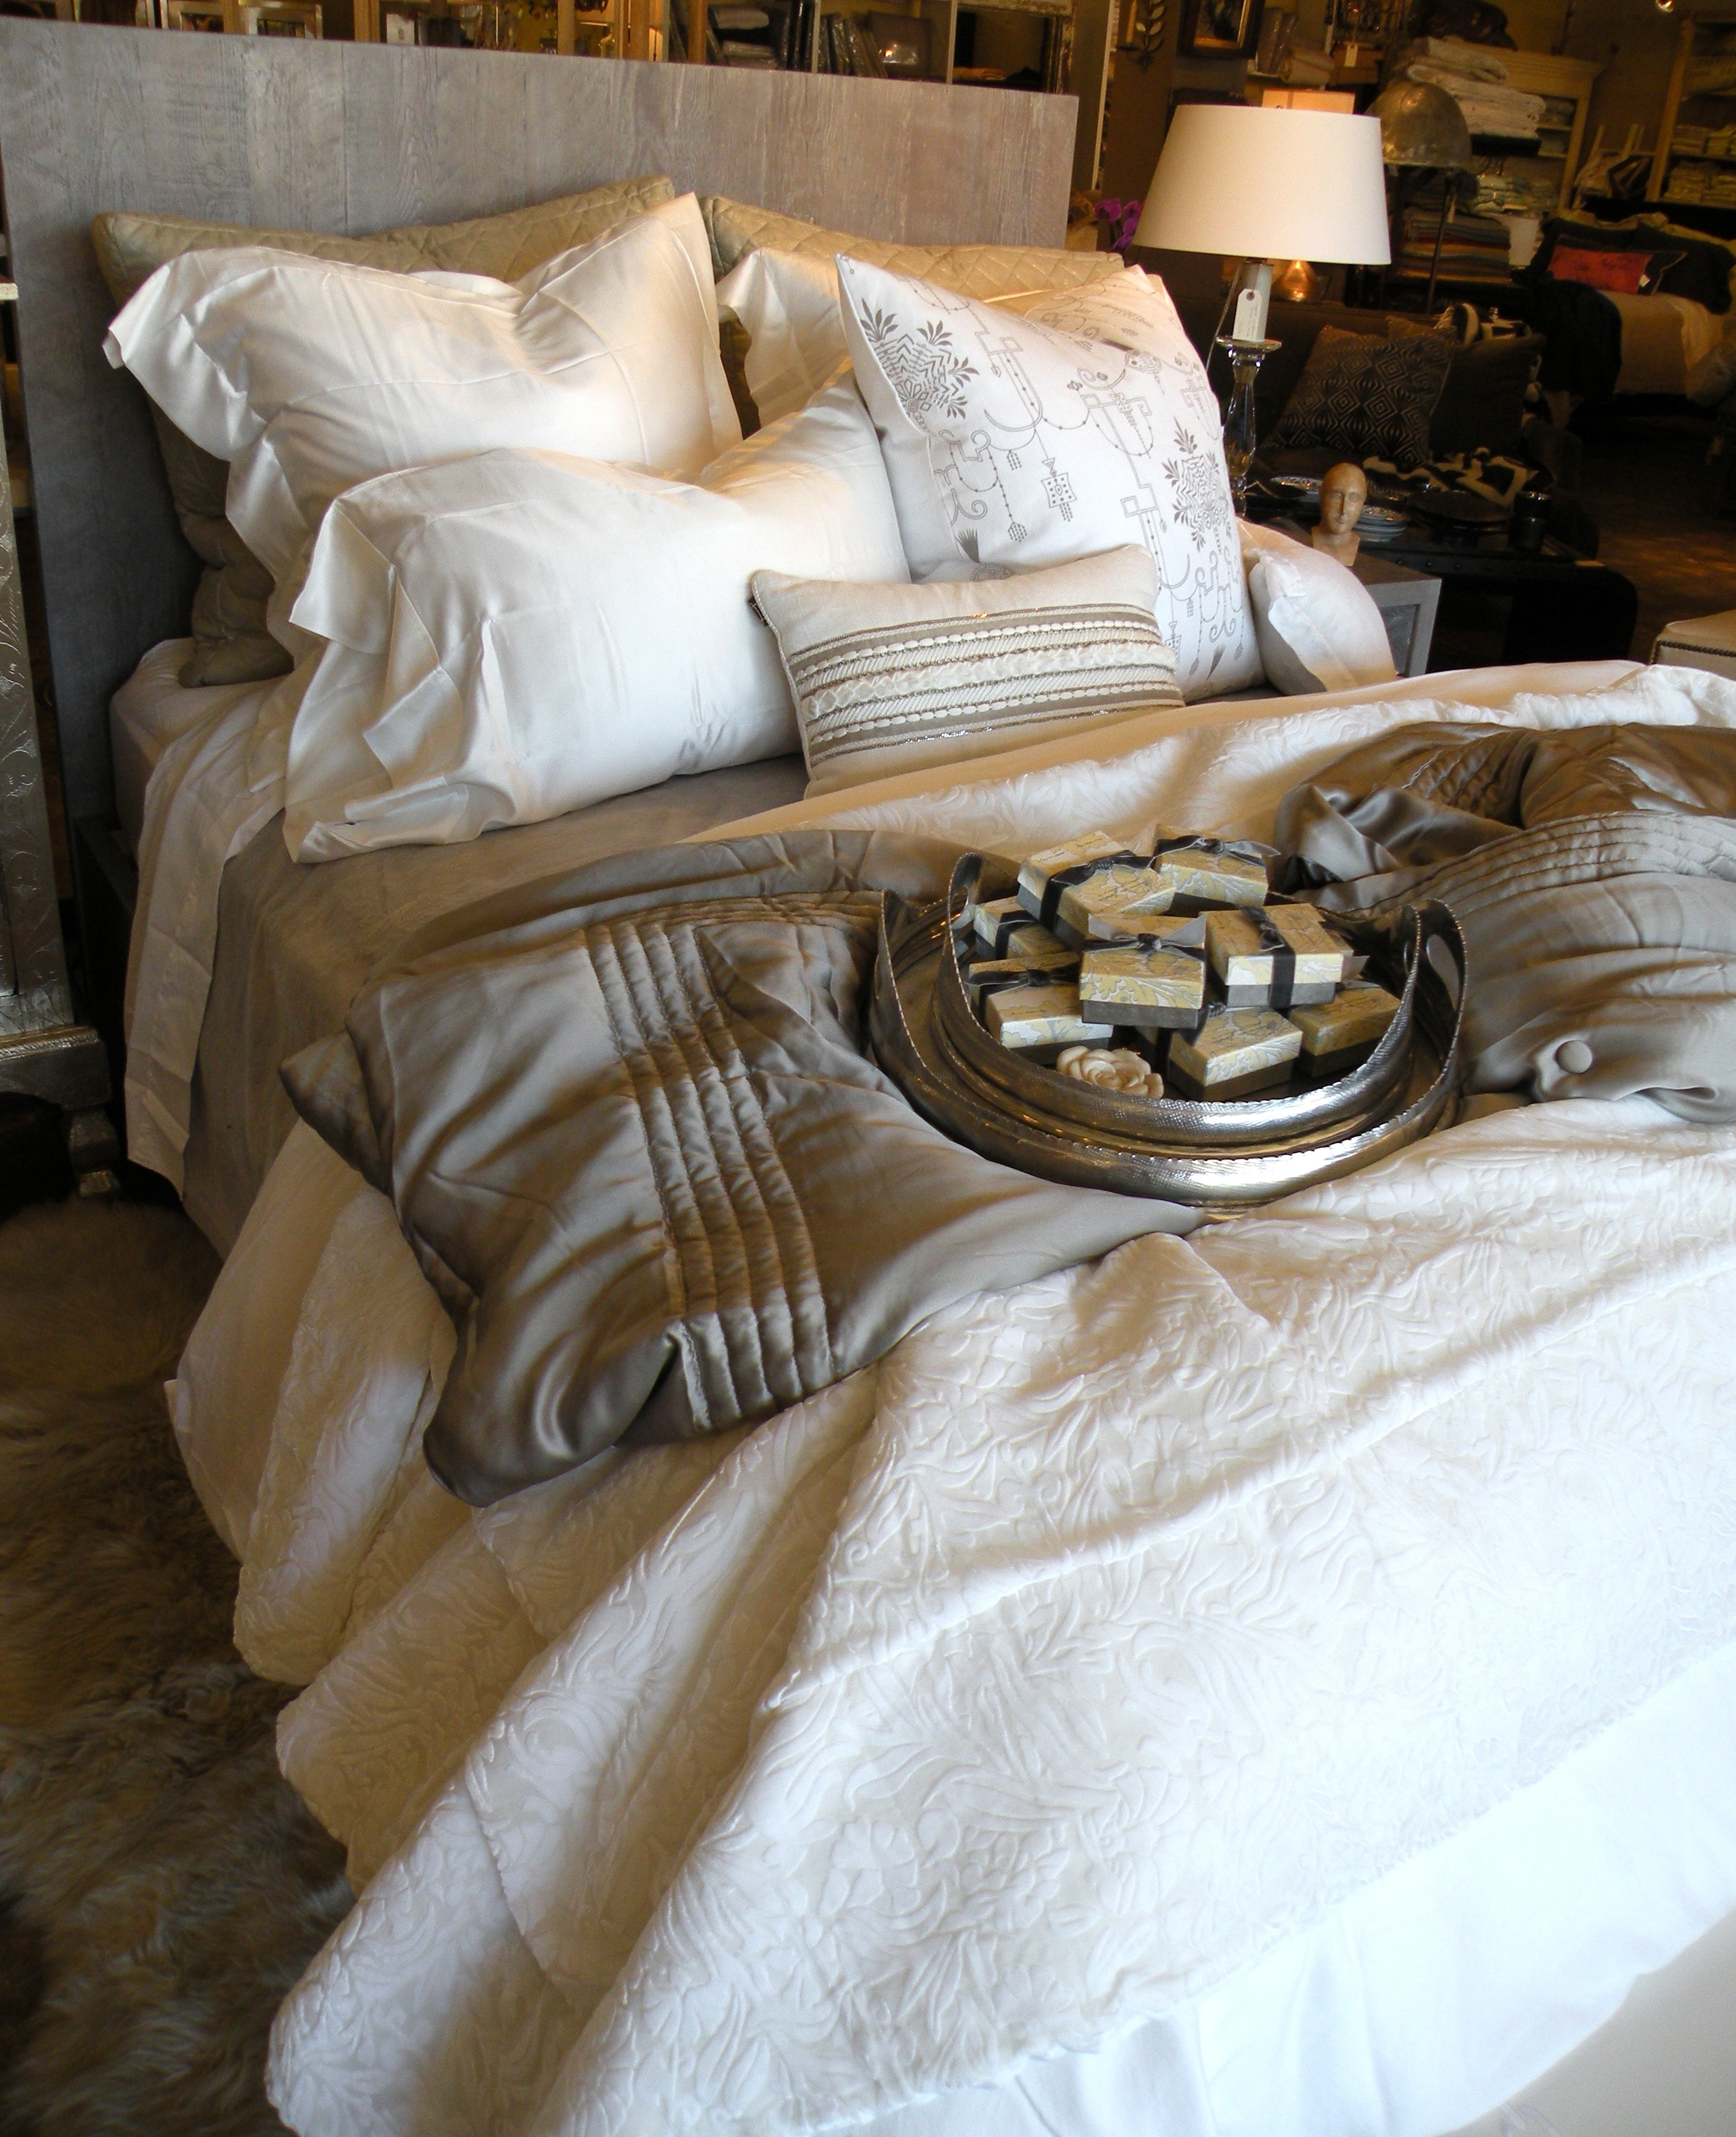 Organic Bedroom Furniture Organic Bed By Urban Woods And Wildflower Organics Urban Woods